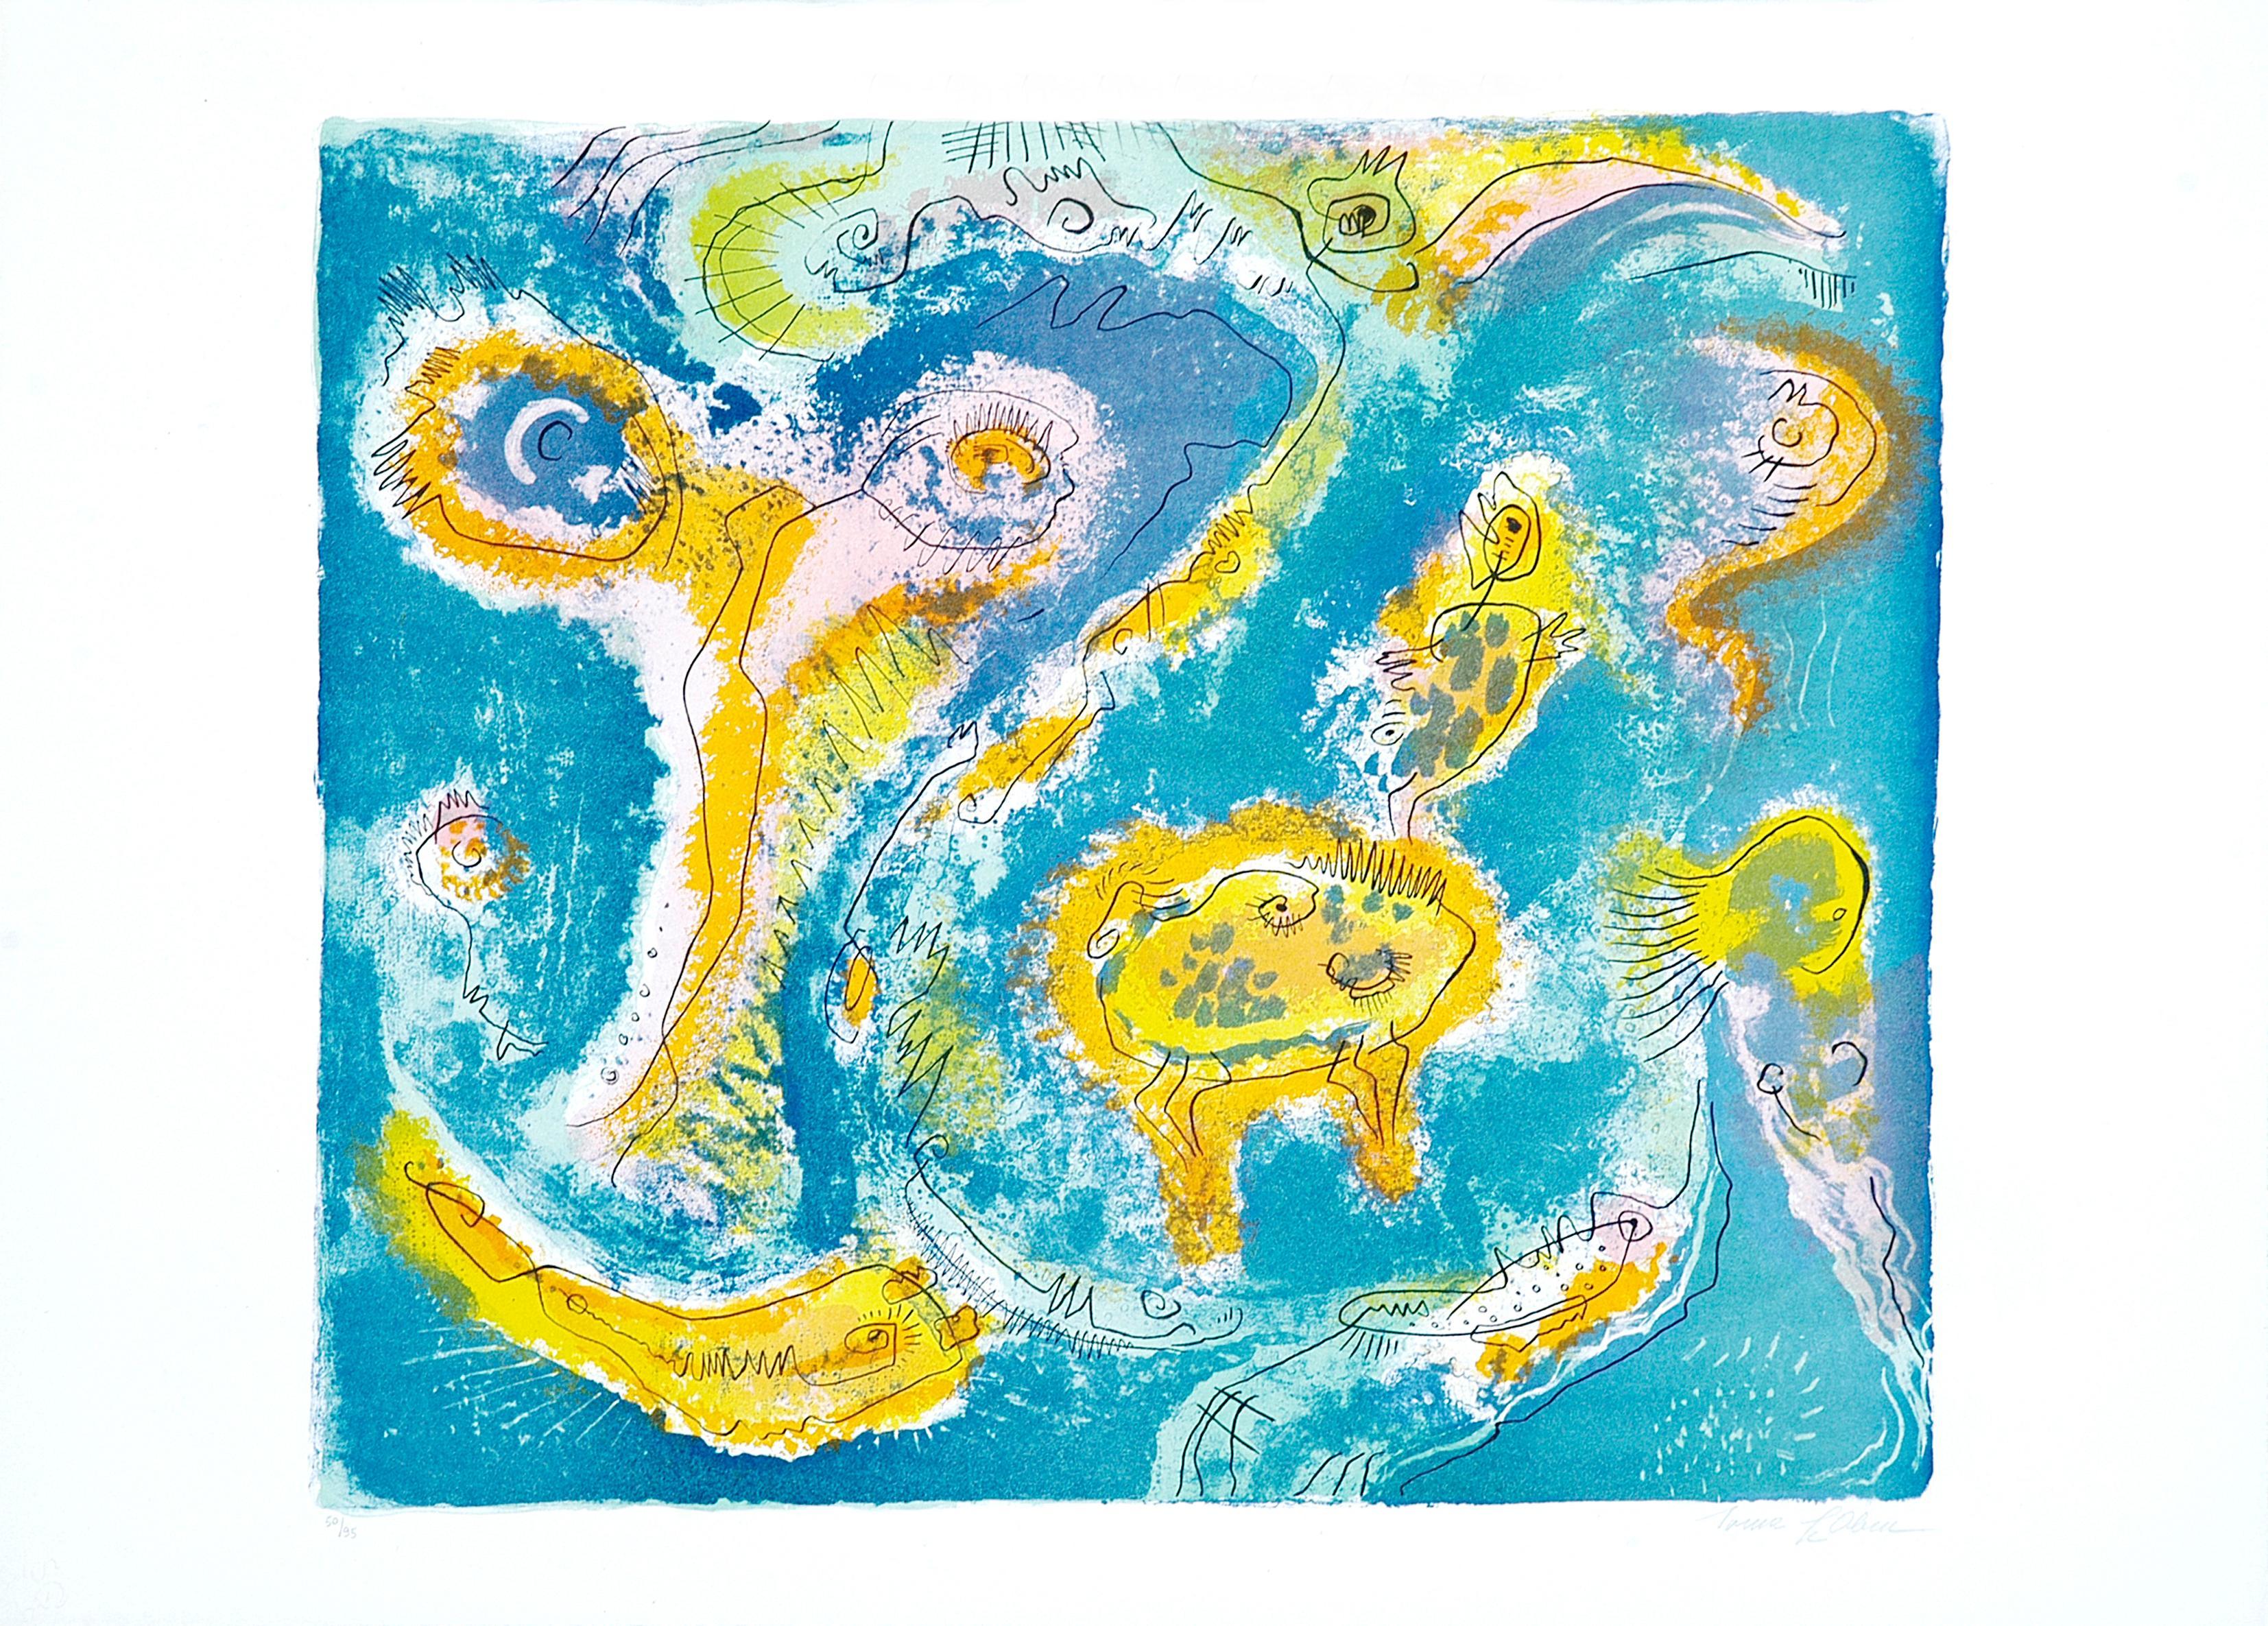 The Pond - Original Lithograph by Le Oben - 1970 ca.